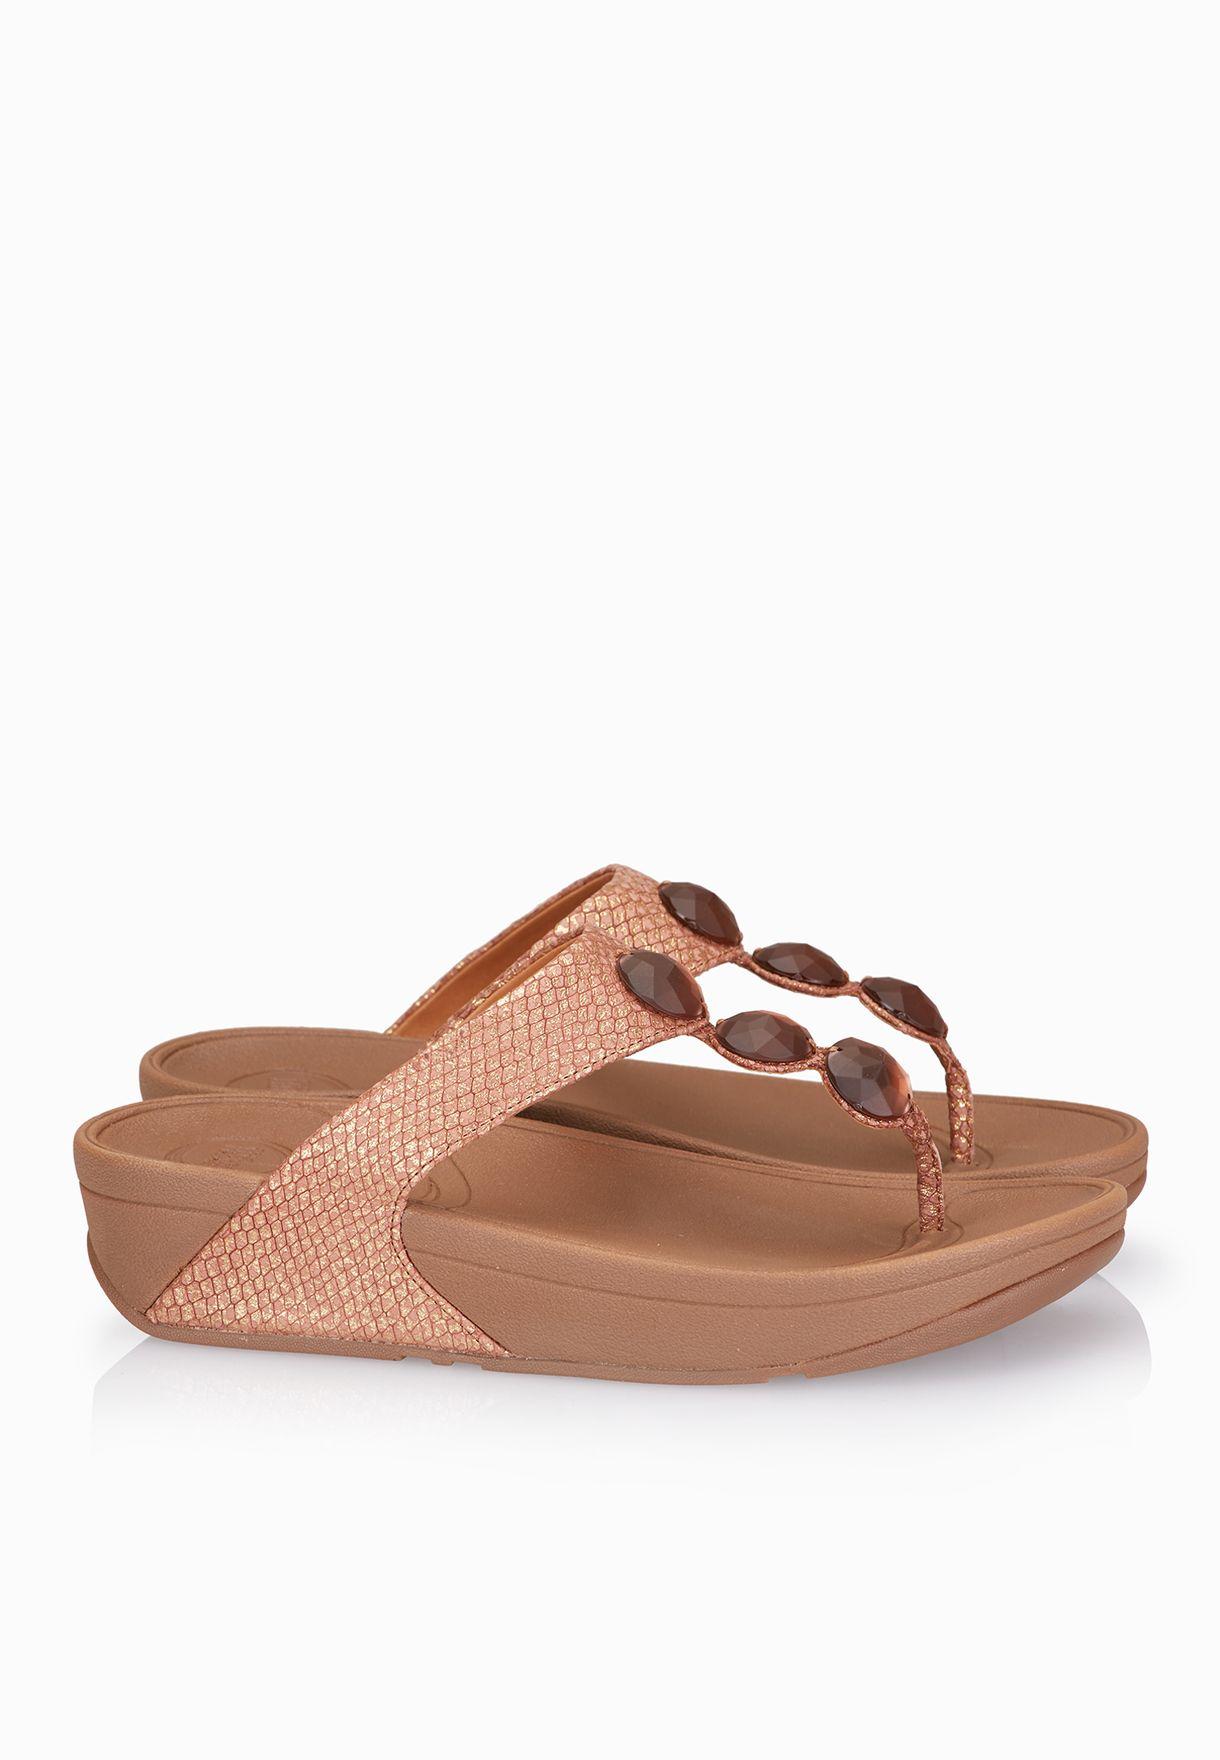 17dd22f145cafc Shop Fitflop bronze Petra Sandals 476-295 for Women in UAE ...